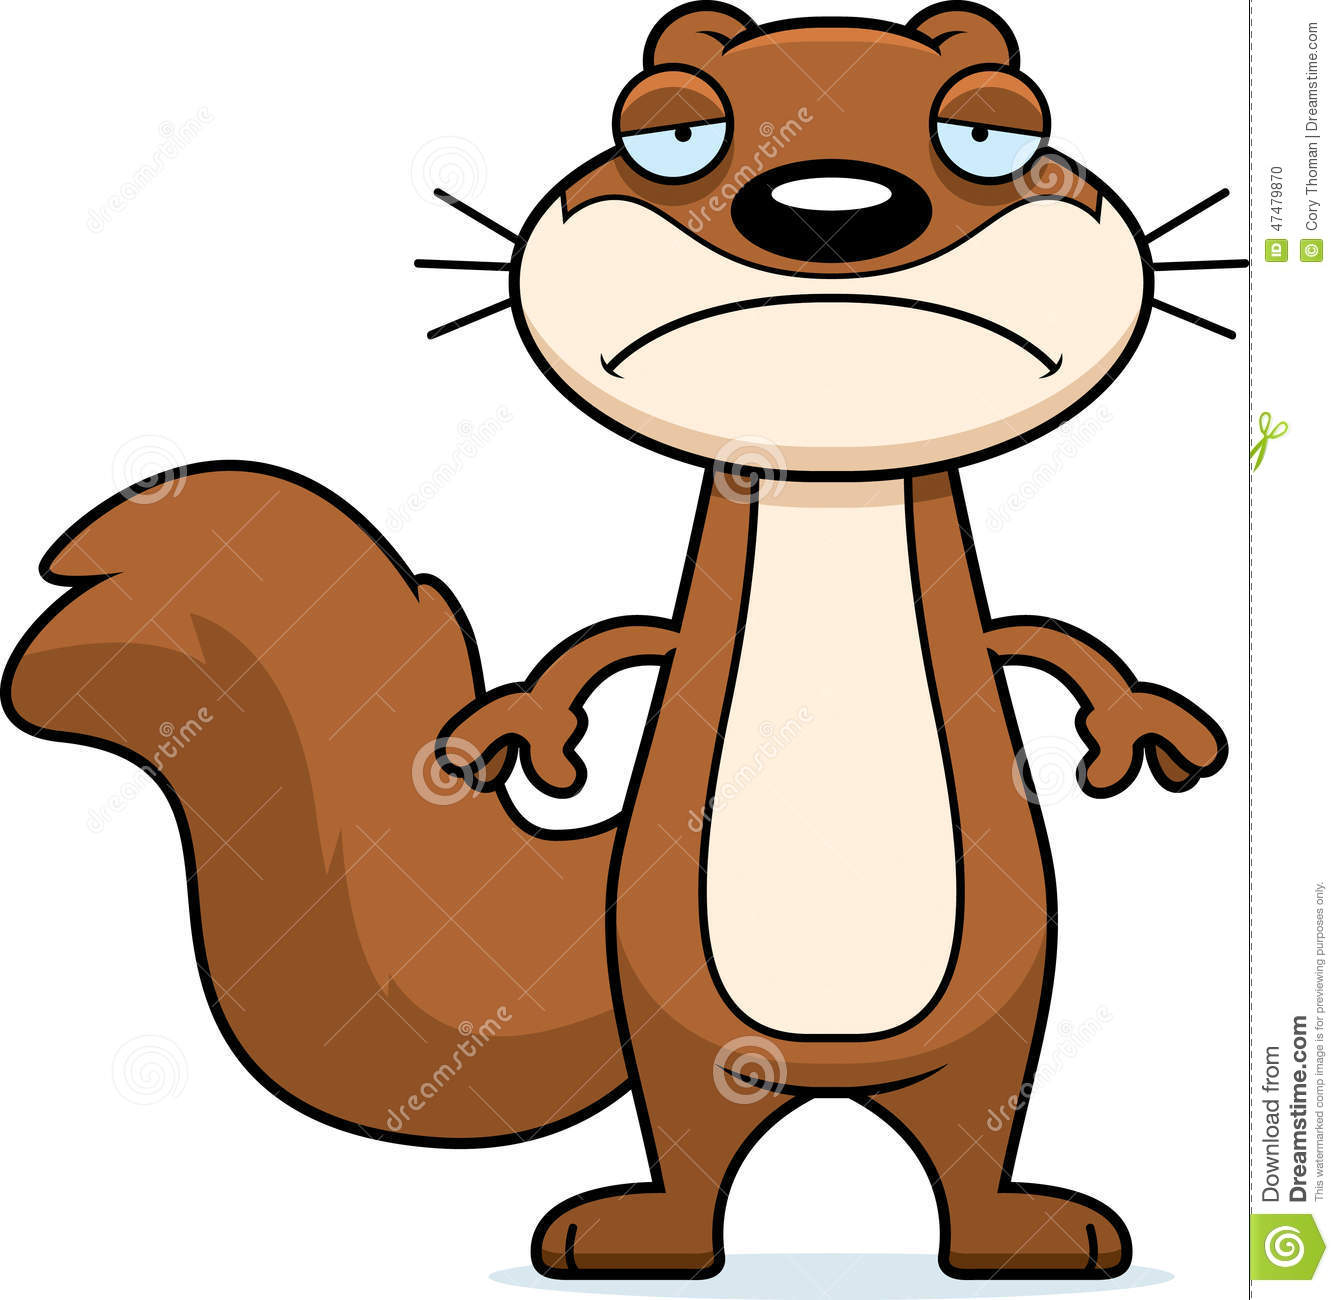 Animated squirrel clipart.